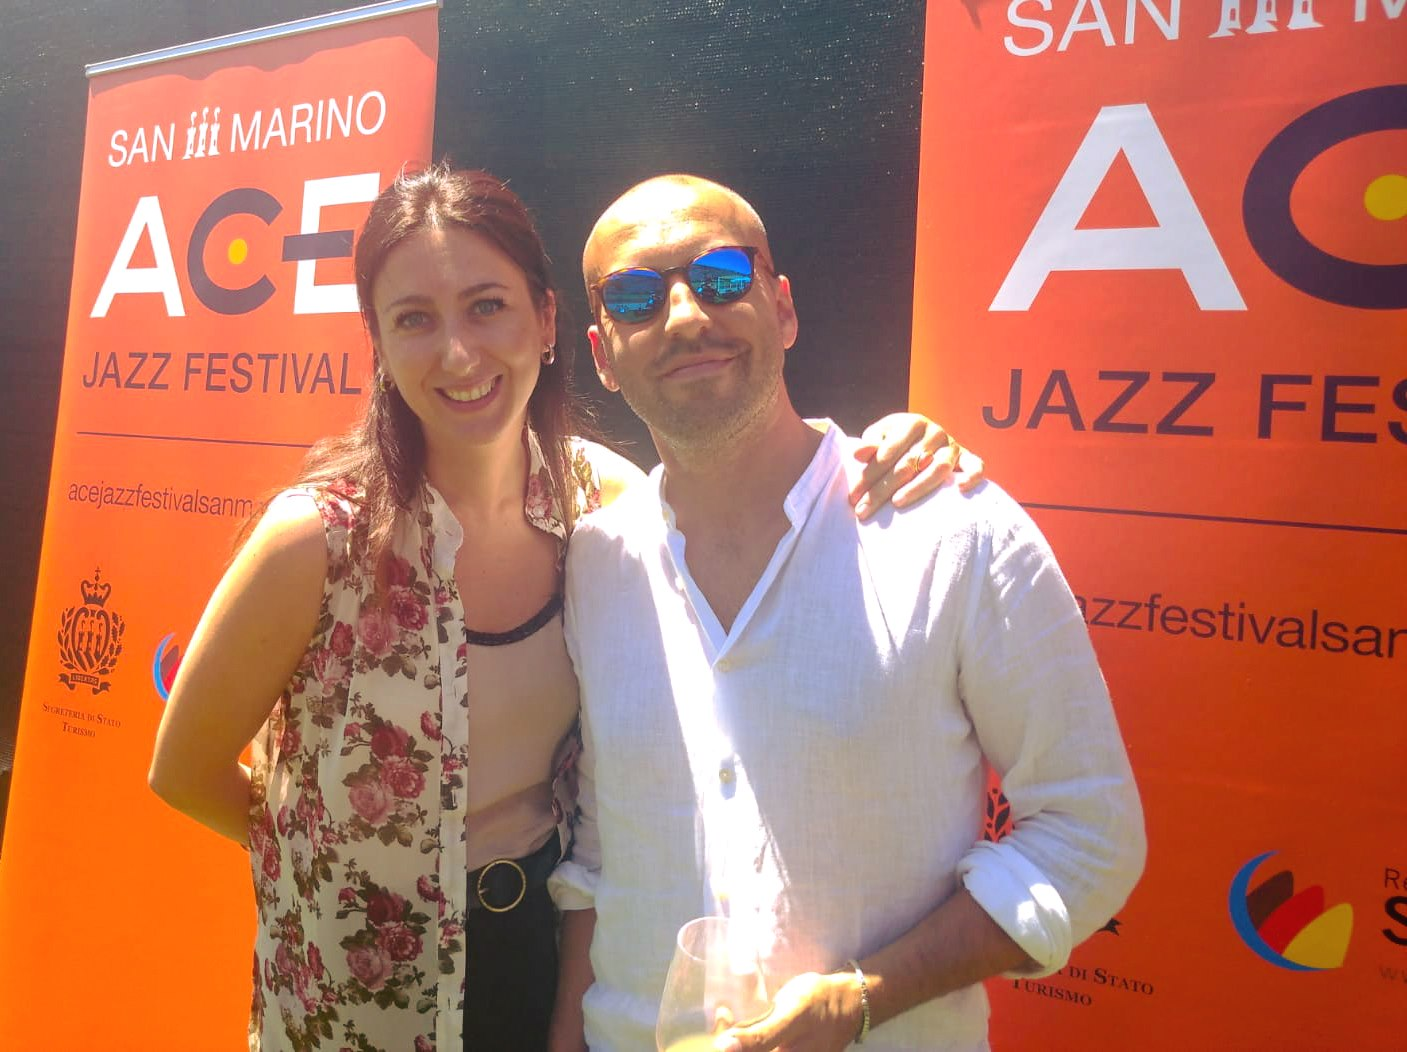 L'Estate del jazz ai tempi del Coronavirus – Ace Jazz Festival San Marino